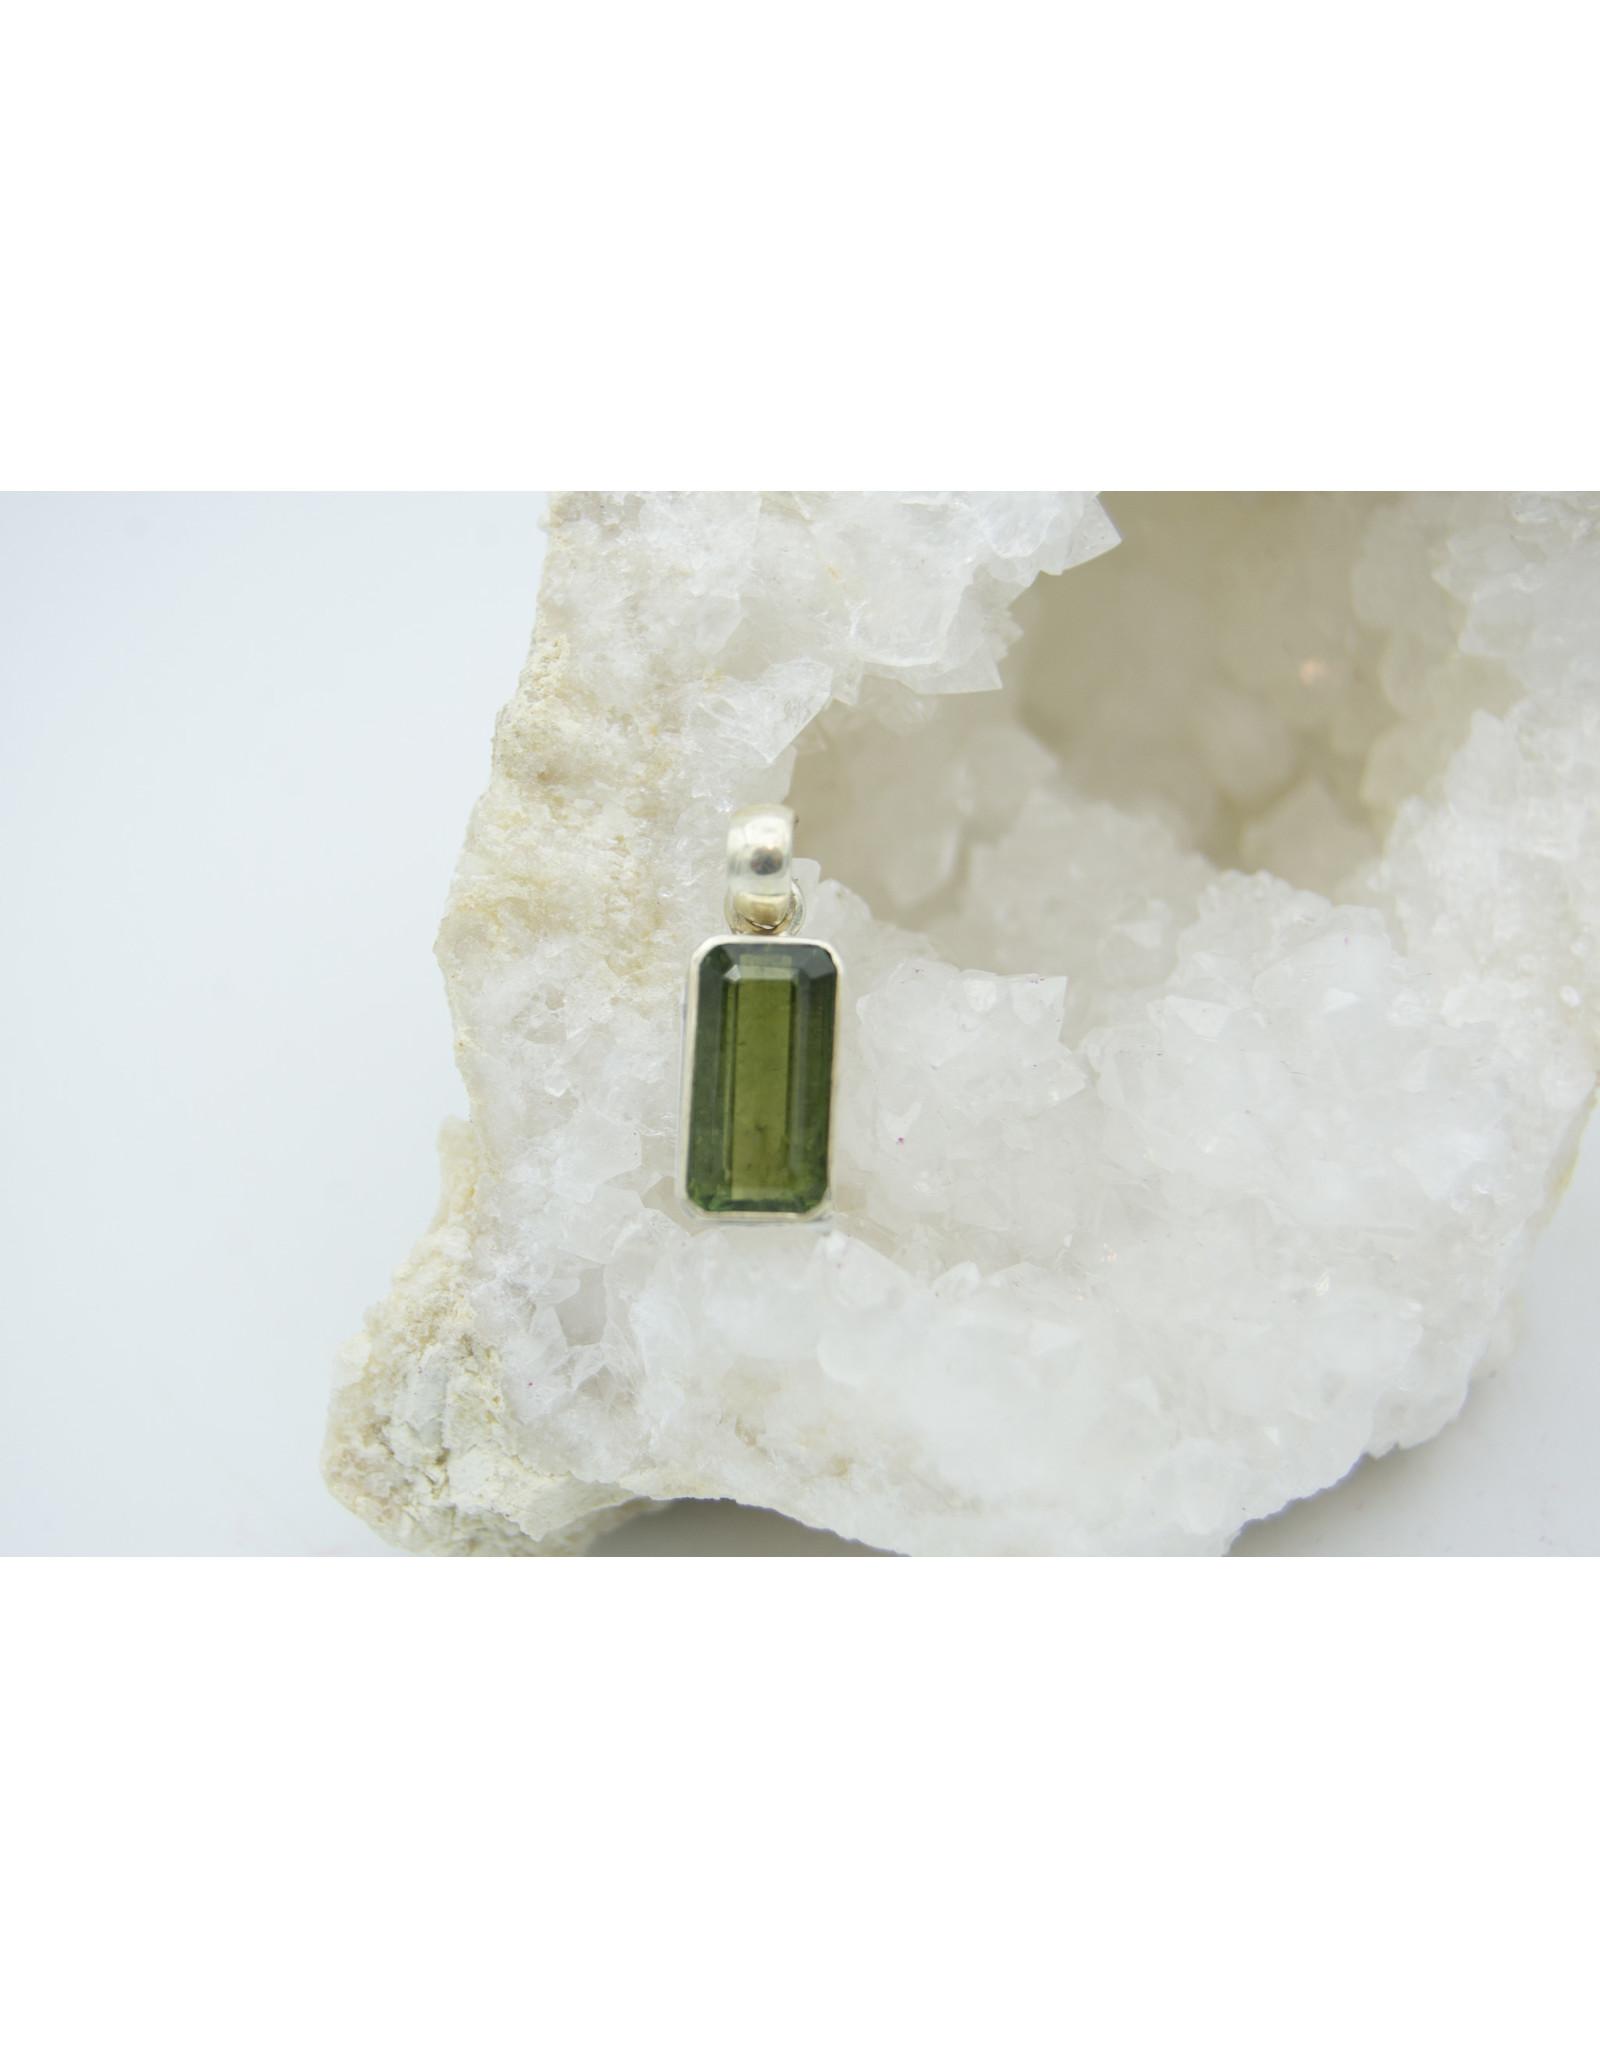 Green Tourmaline Pendant